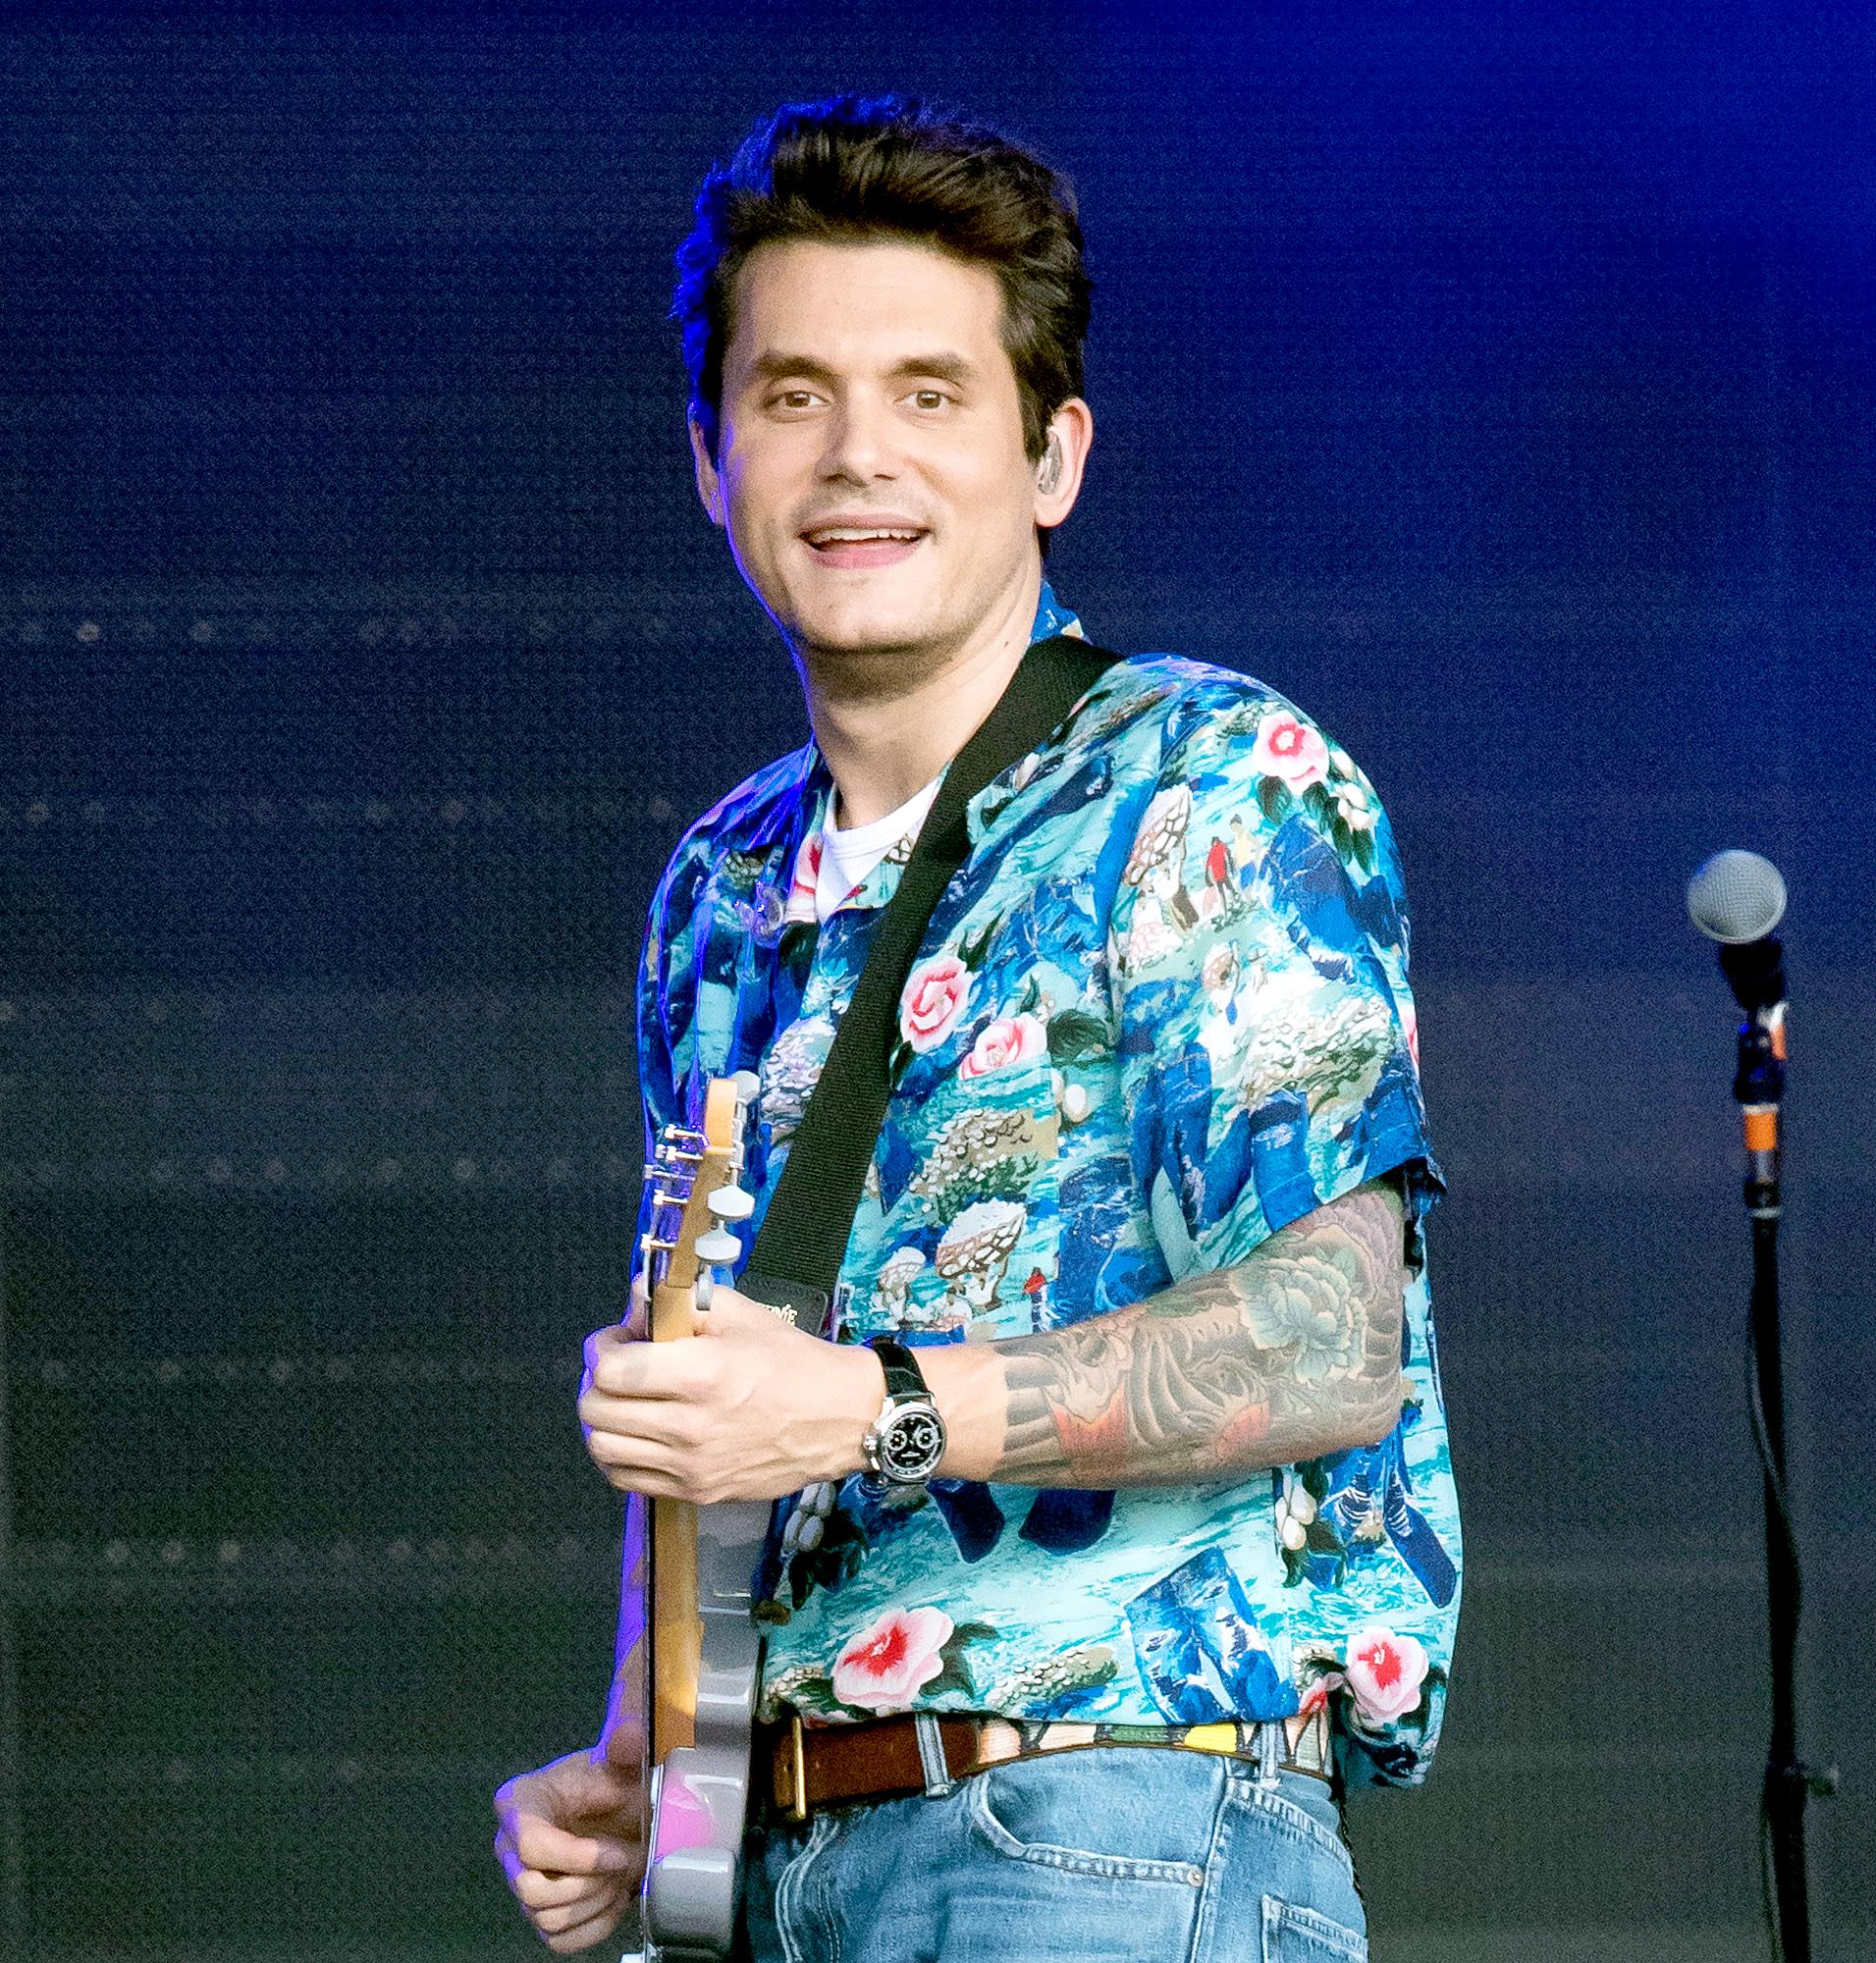 John Mayer Live In La: John Mayer Offers Funny Response To Fan Asking Why He's